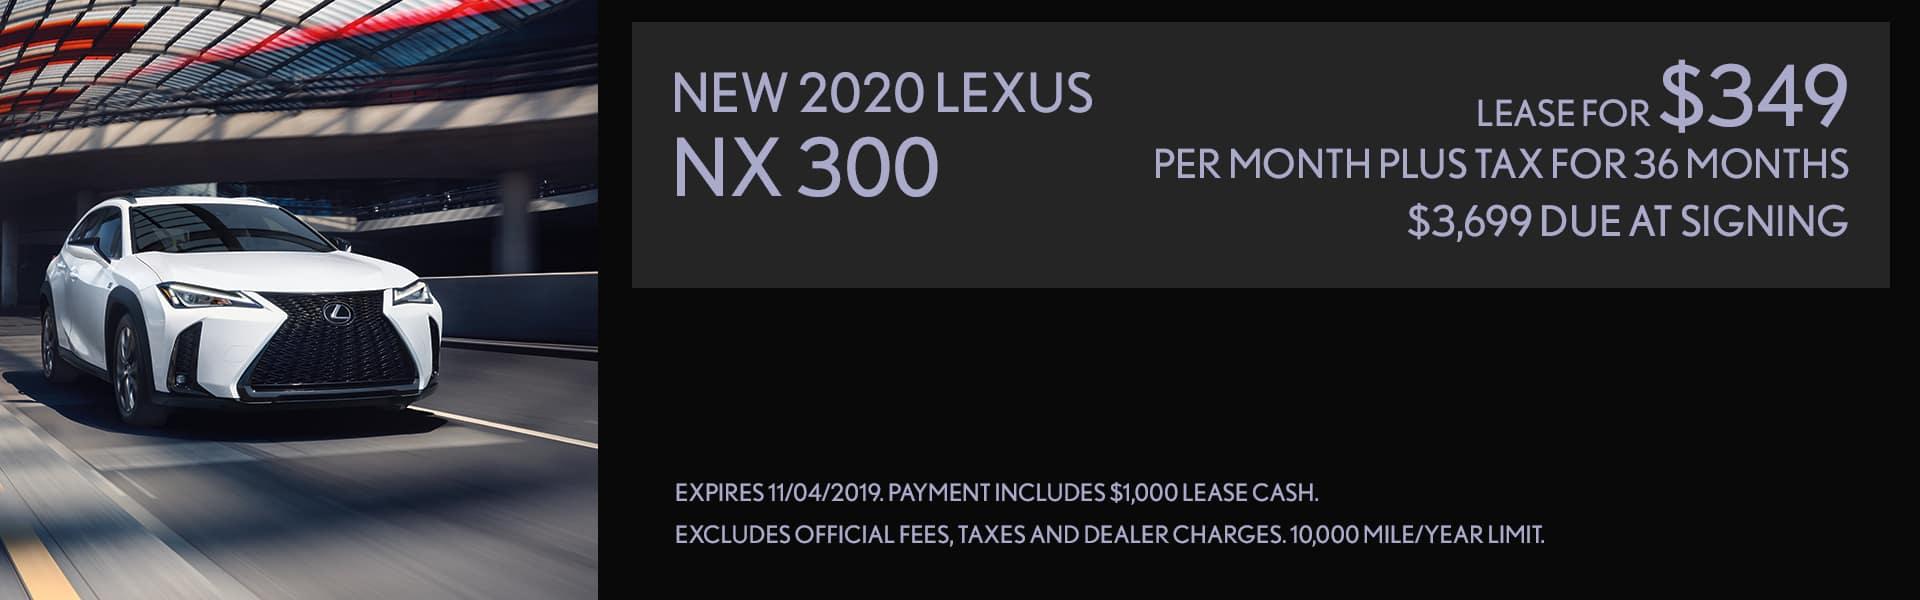 Lease Lexus NX 300